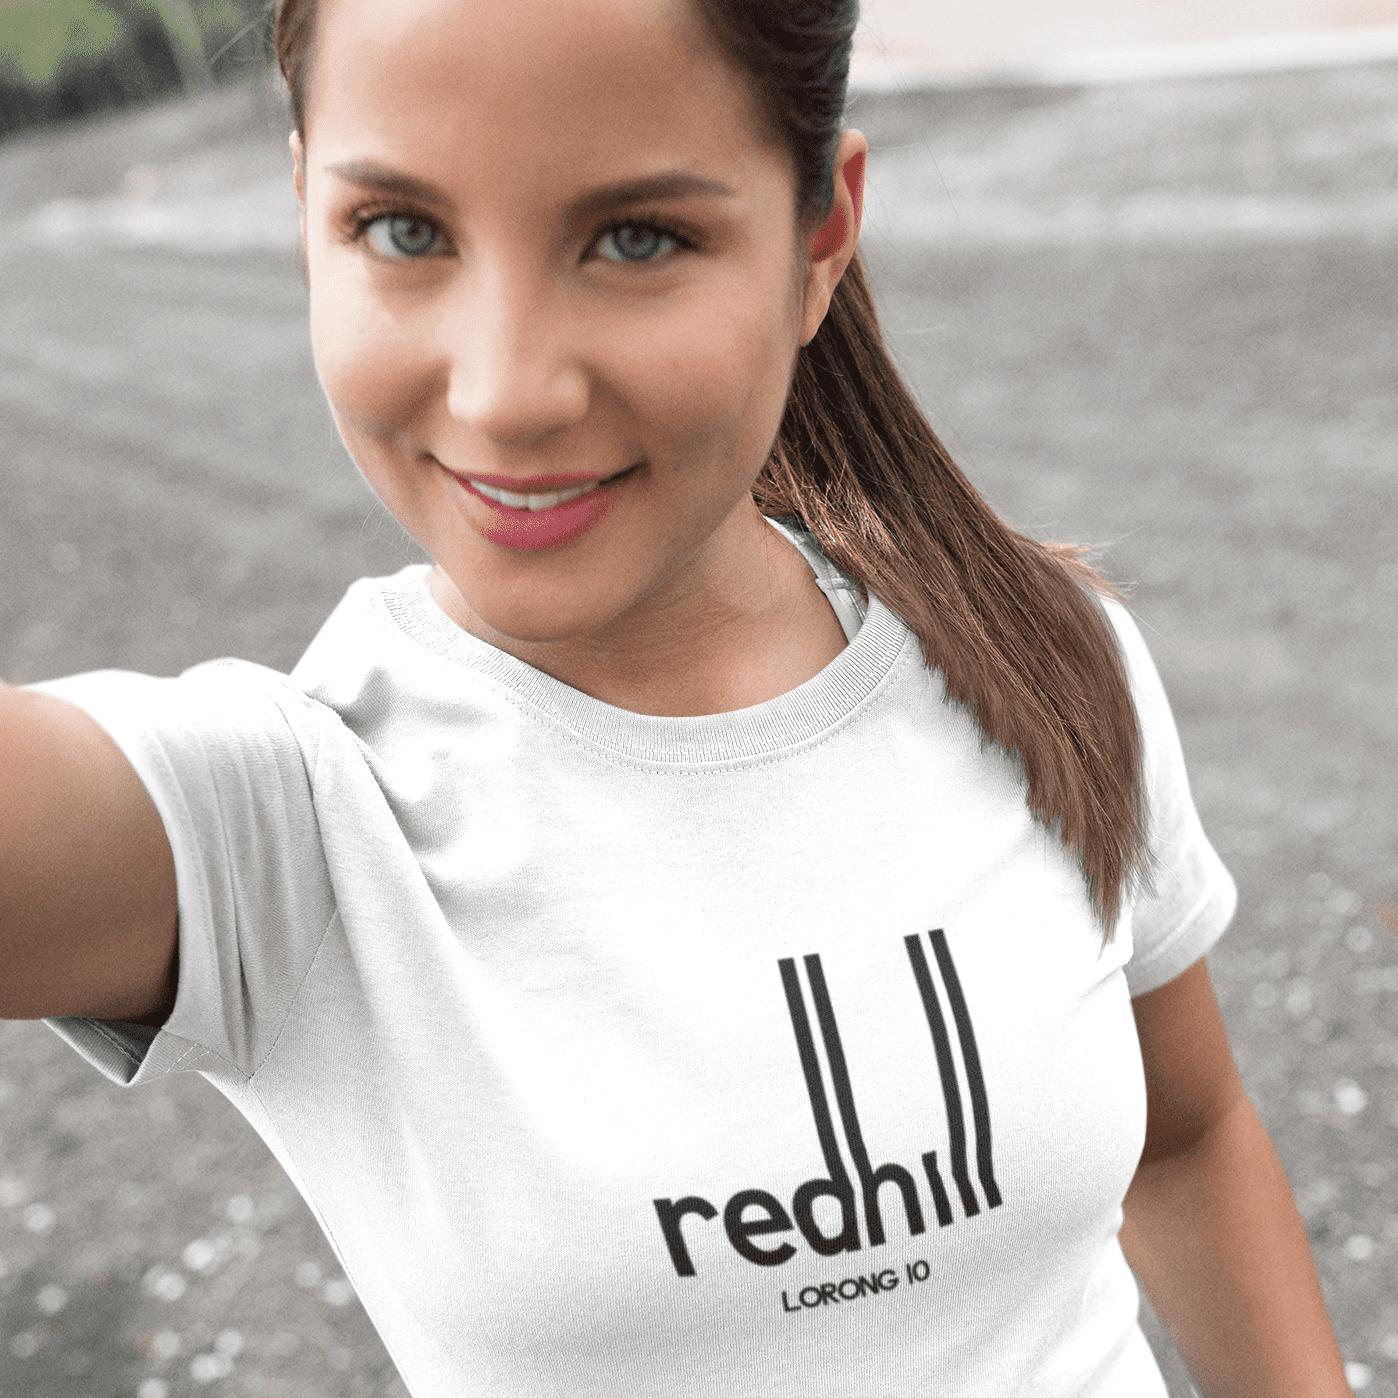 Redhill Short Sleeve T-shirt